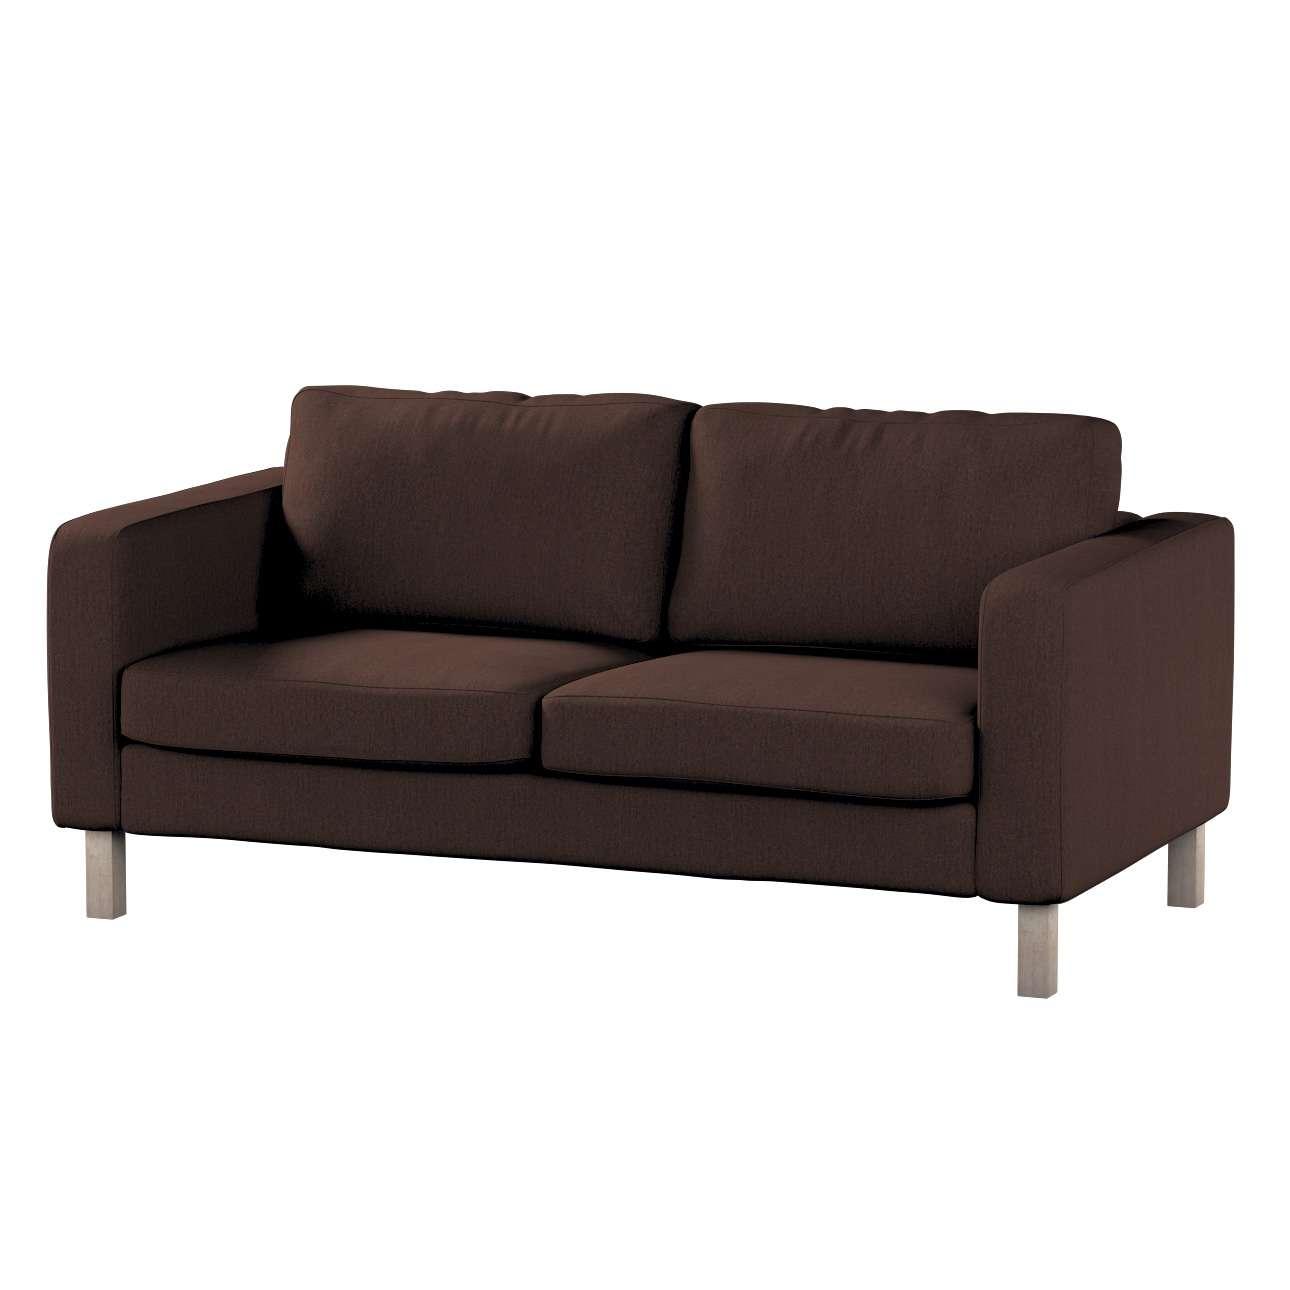 KARSLTAD dvivietės sofos užvalkalas Karlstad 2-vietės sofos užvalkalas kolekcijoje Chenille, audinys: 702-18